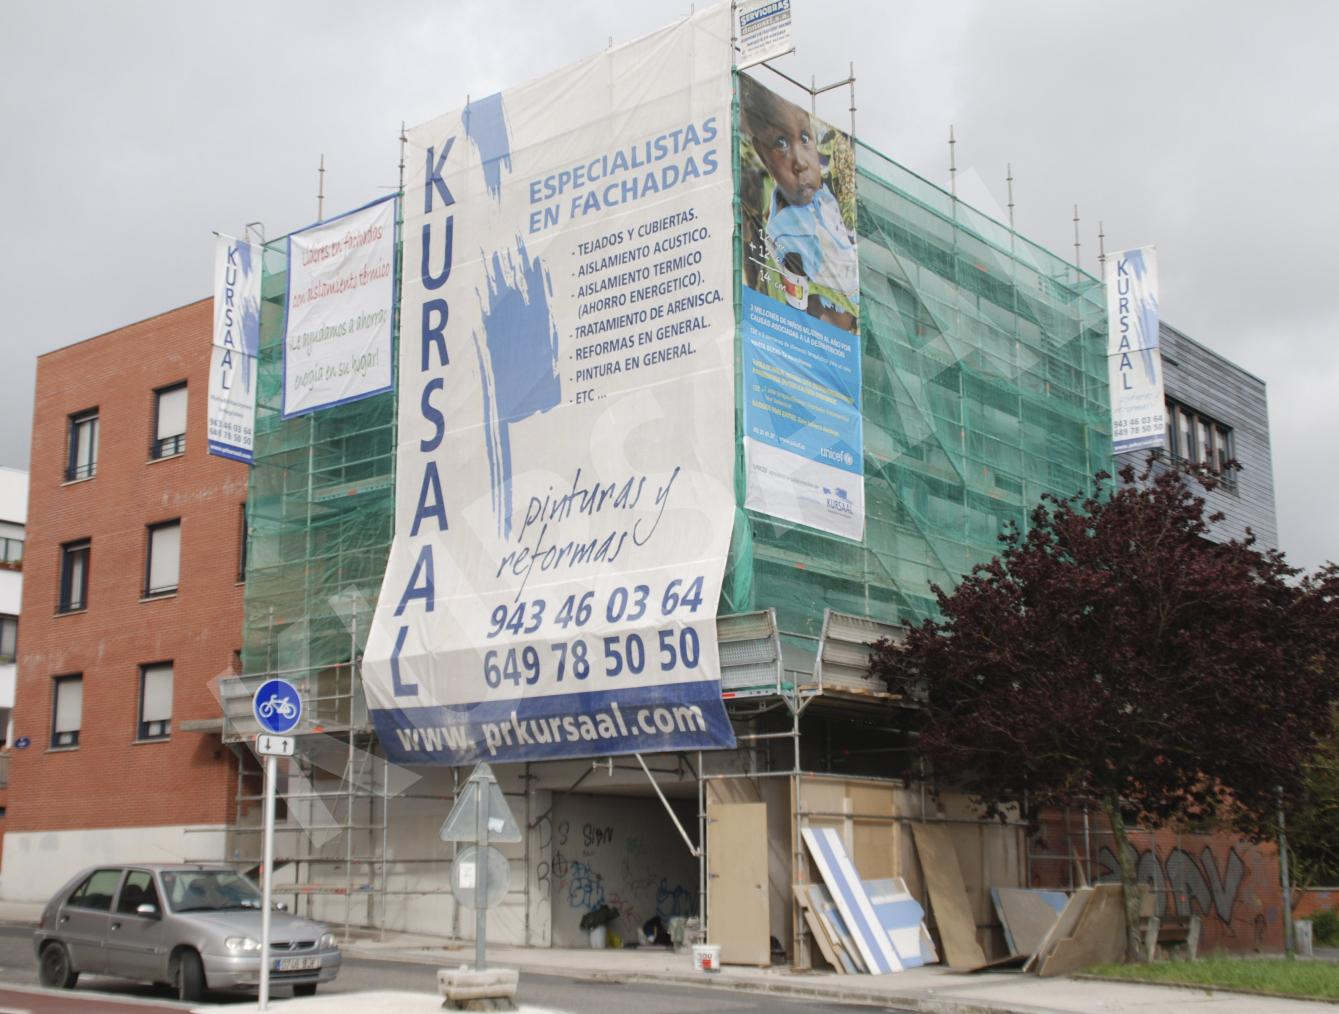 foto 7 - Aislamientos Térmicos y Eficiencia Energética-Castilla 19-DONOSTIA, GIPUZKOA